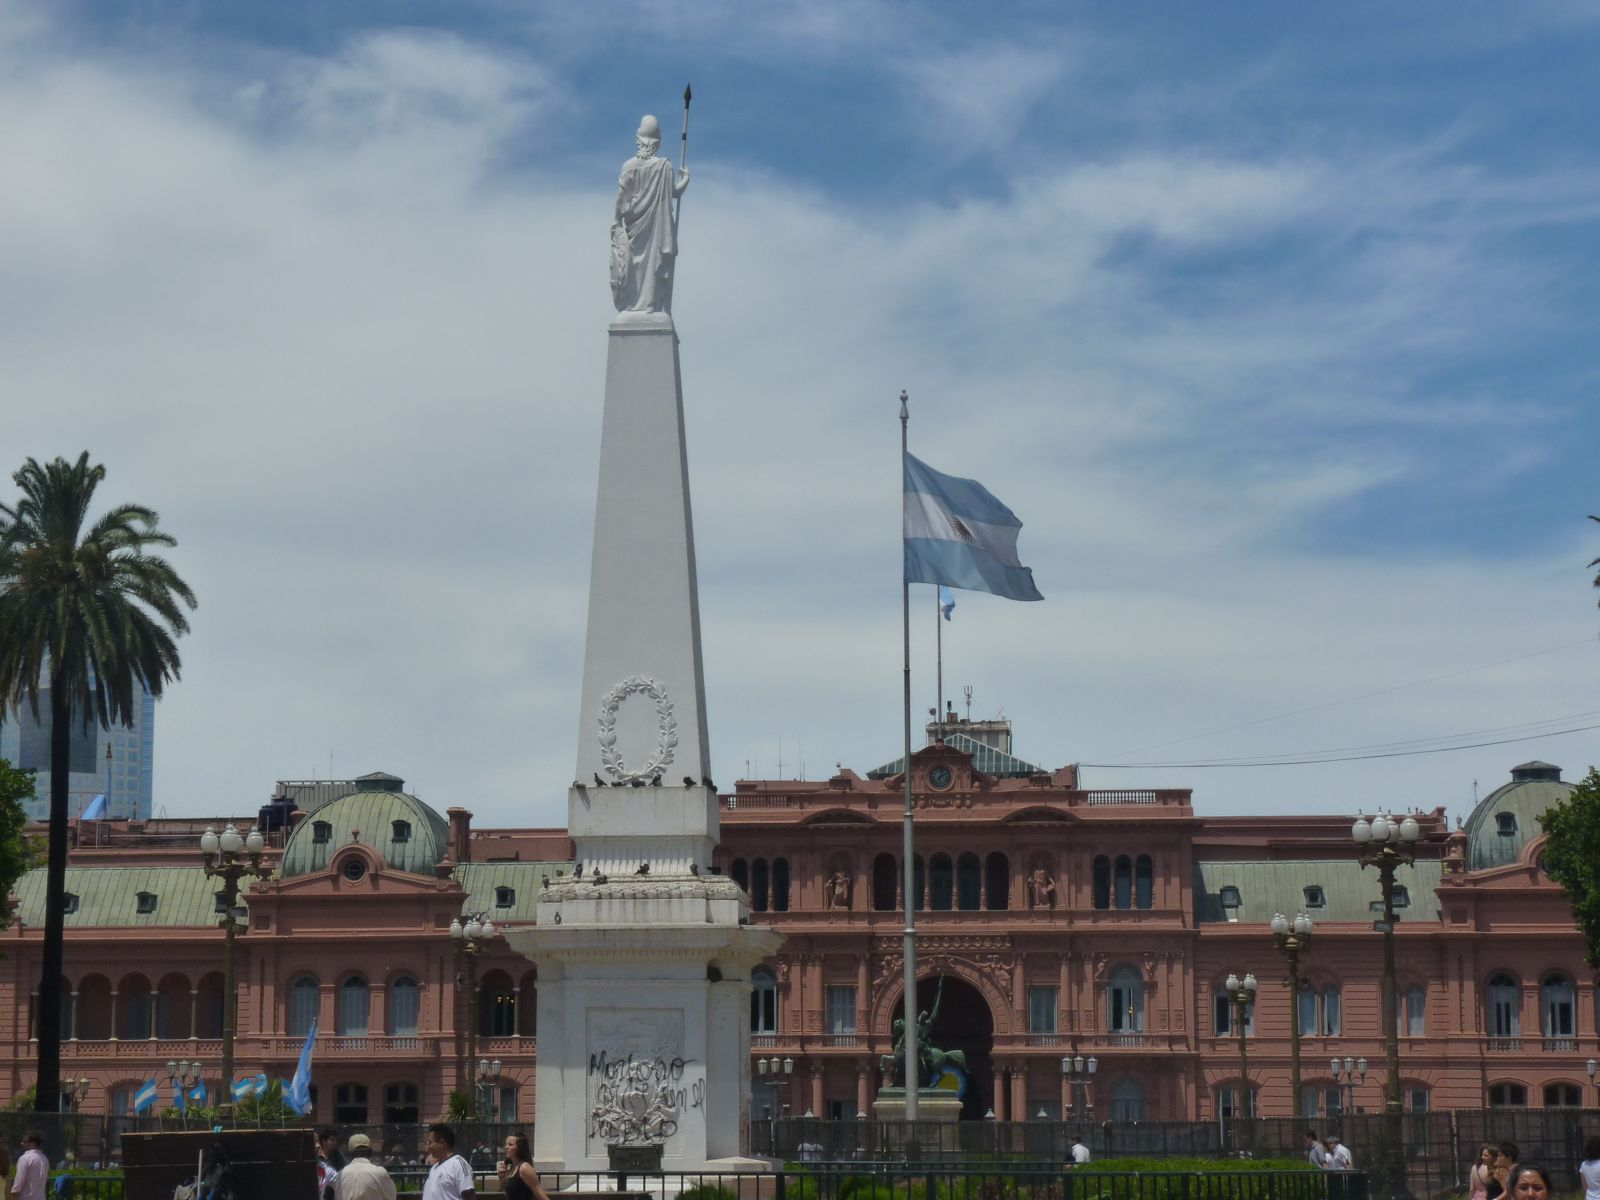 buenos-aires-7_centro_plaza-mayo_obelisque-de-mayo